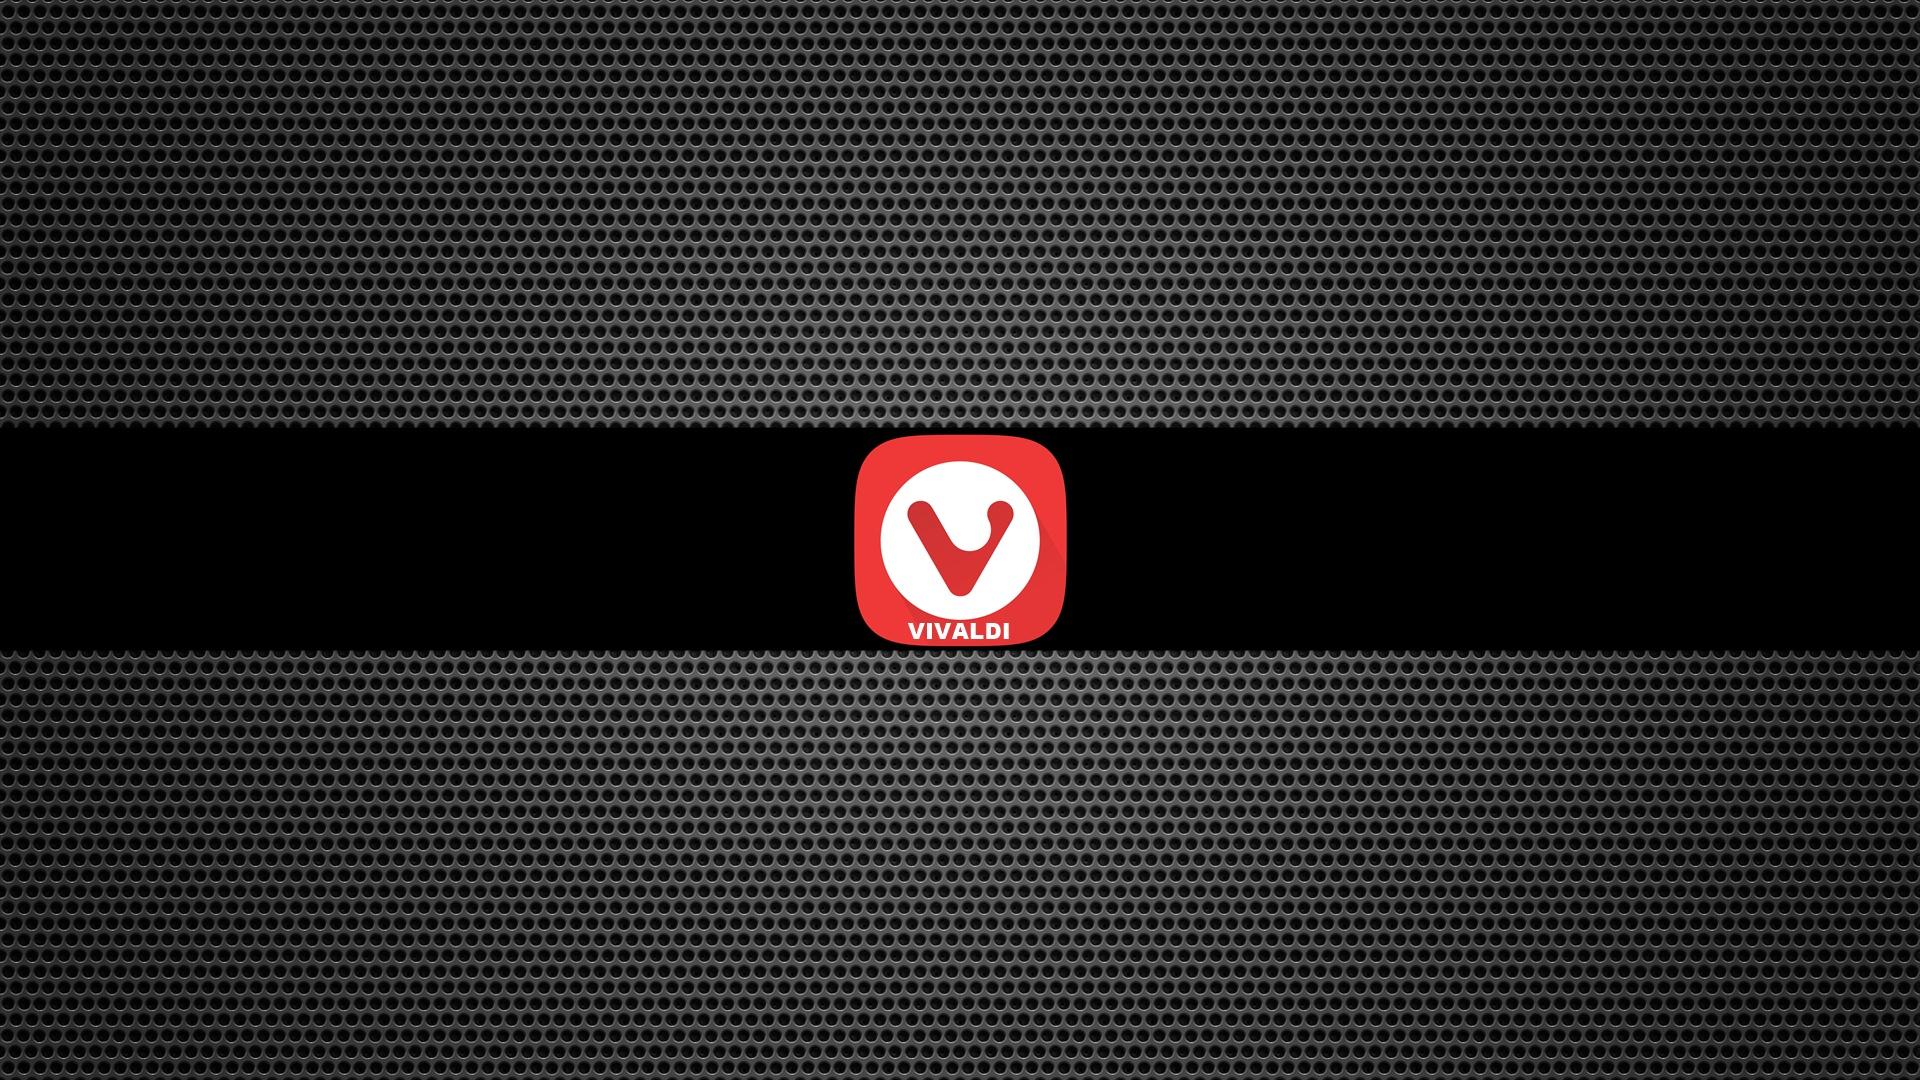 Vivaldi Browser Metal Grid Computer Nerds Gamer